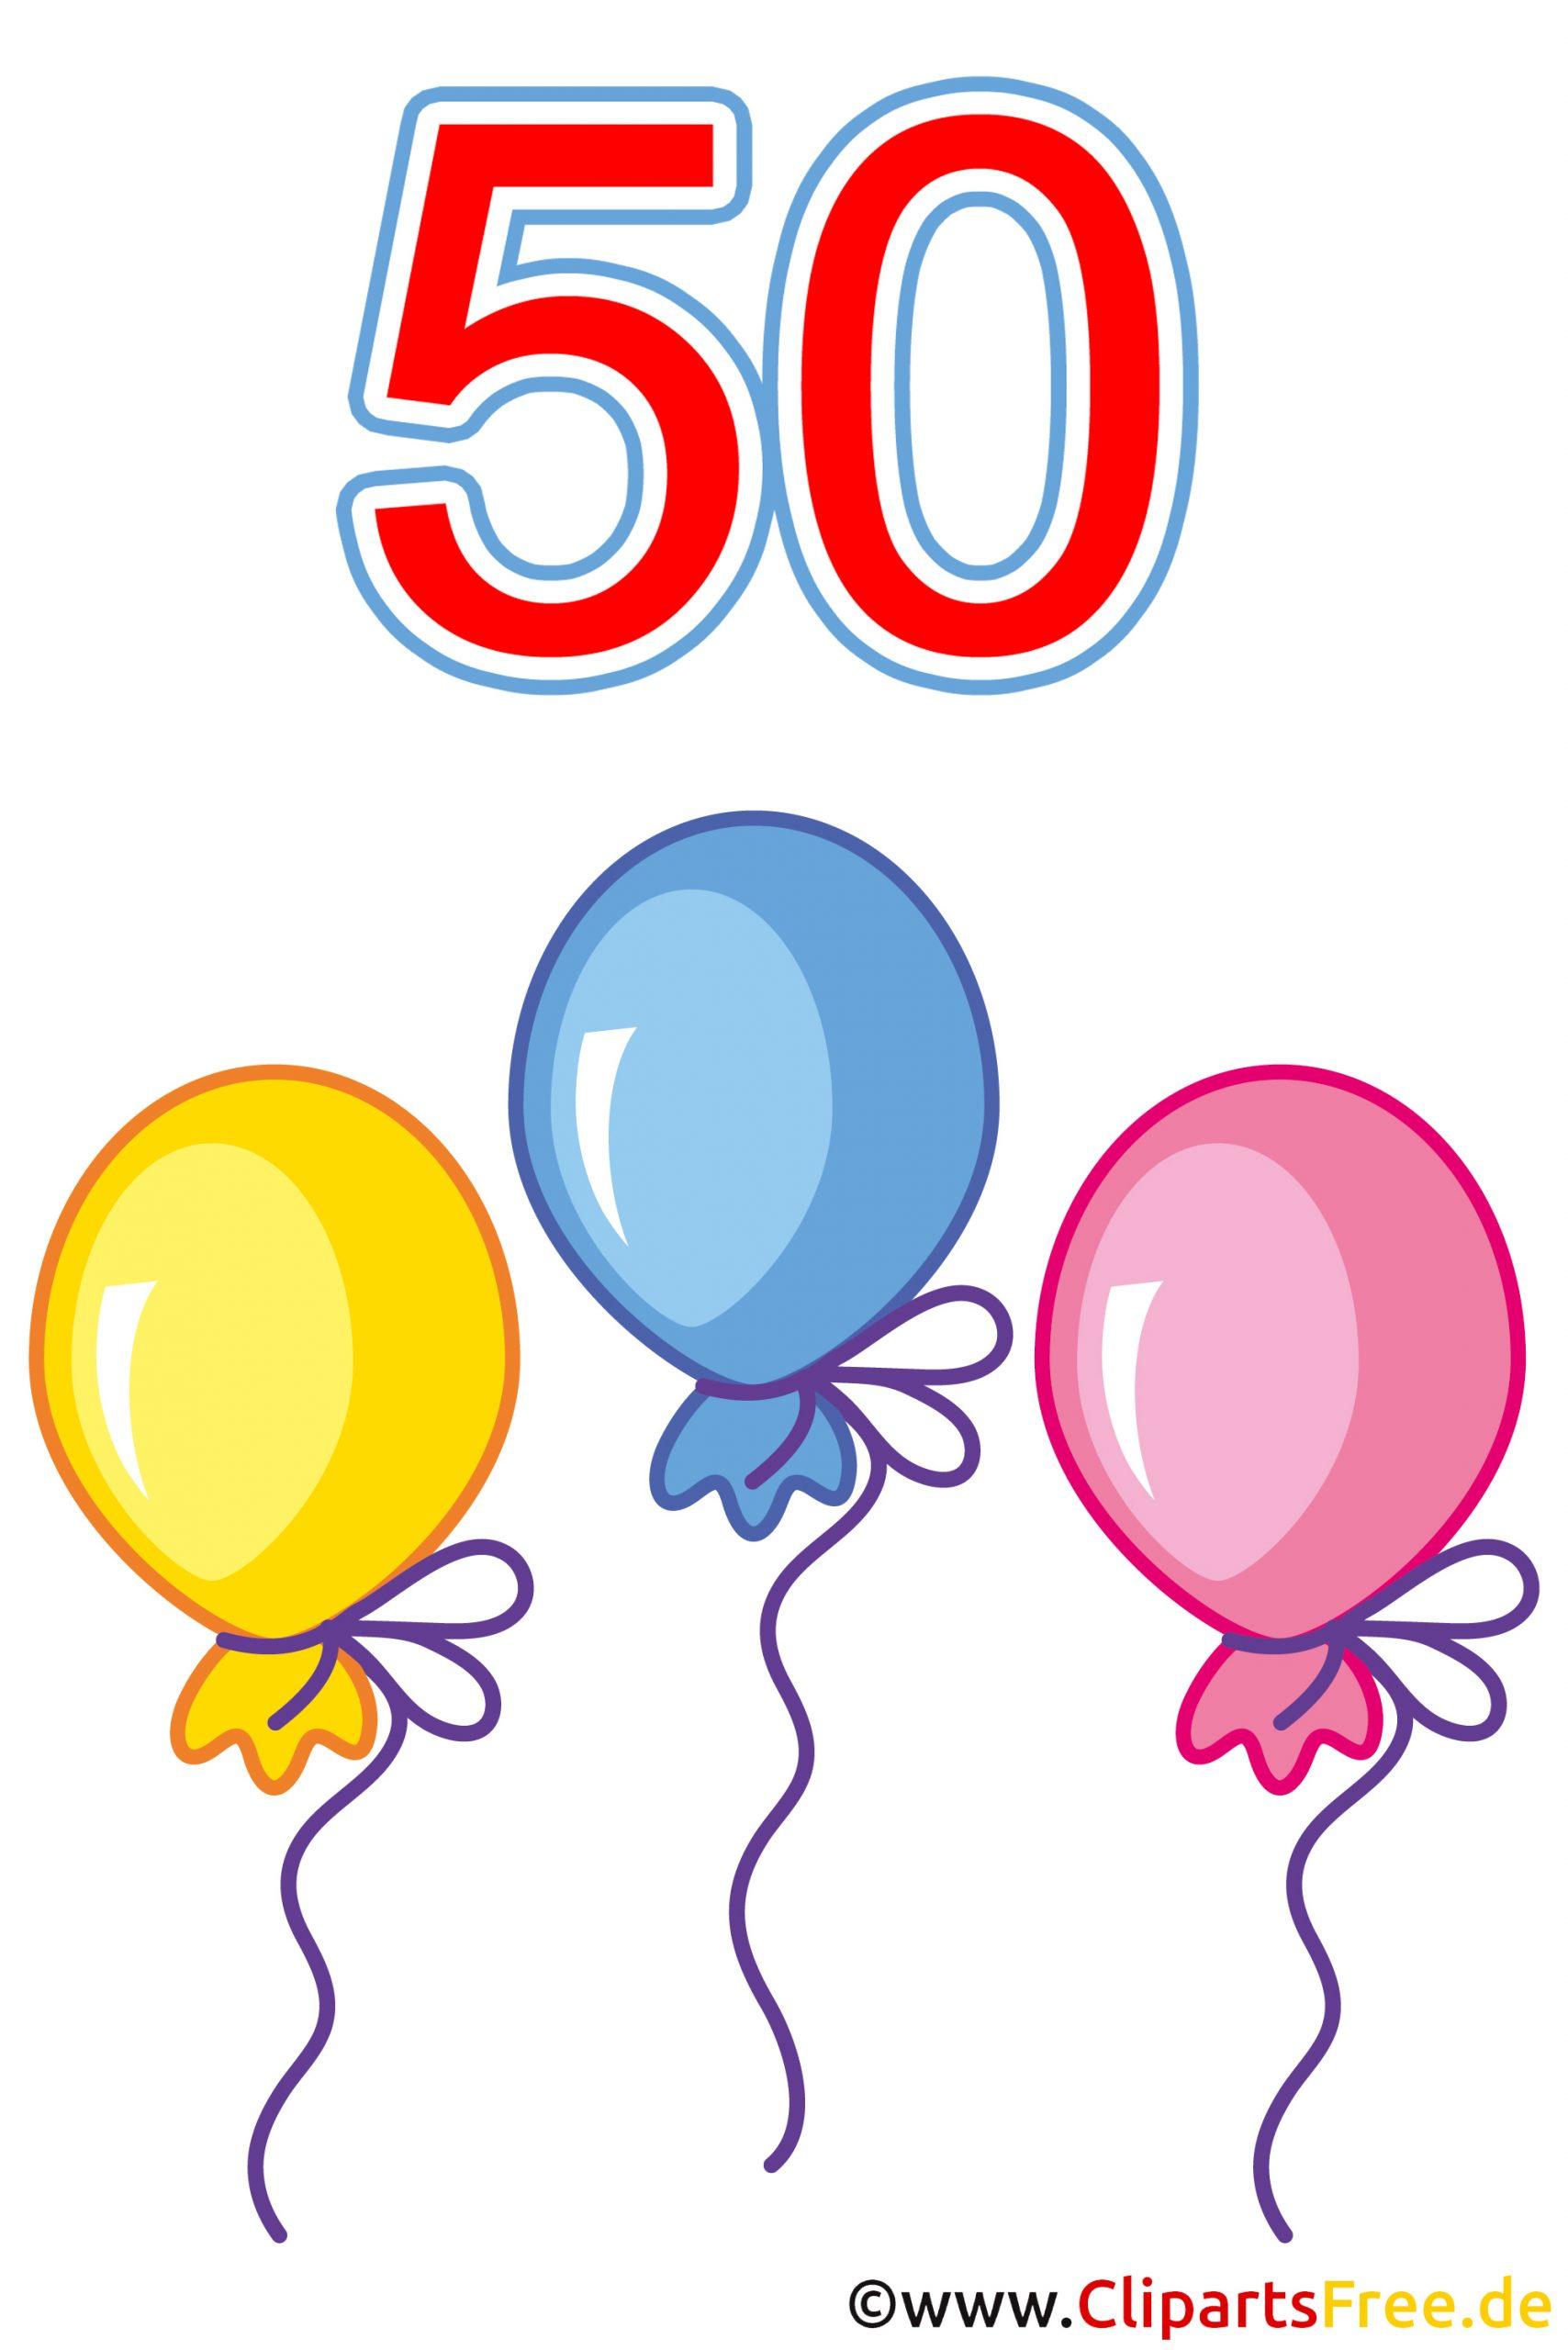 50 Geburtstag Bilder Gratis innen Bild Geburtstag Kostenlos